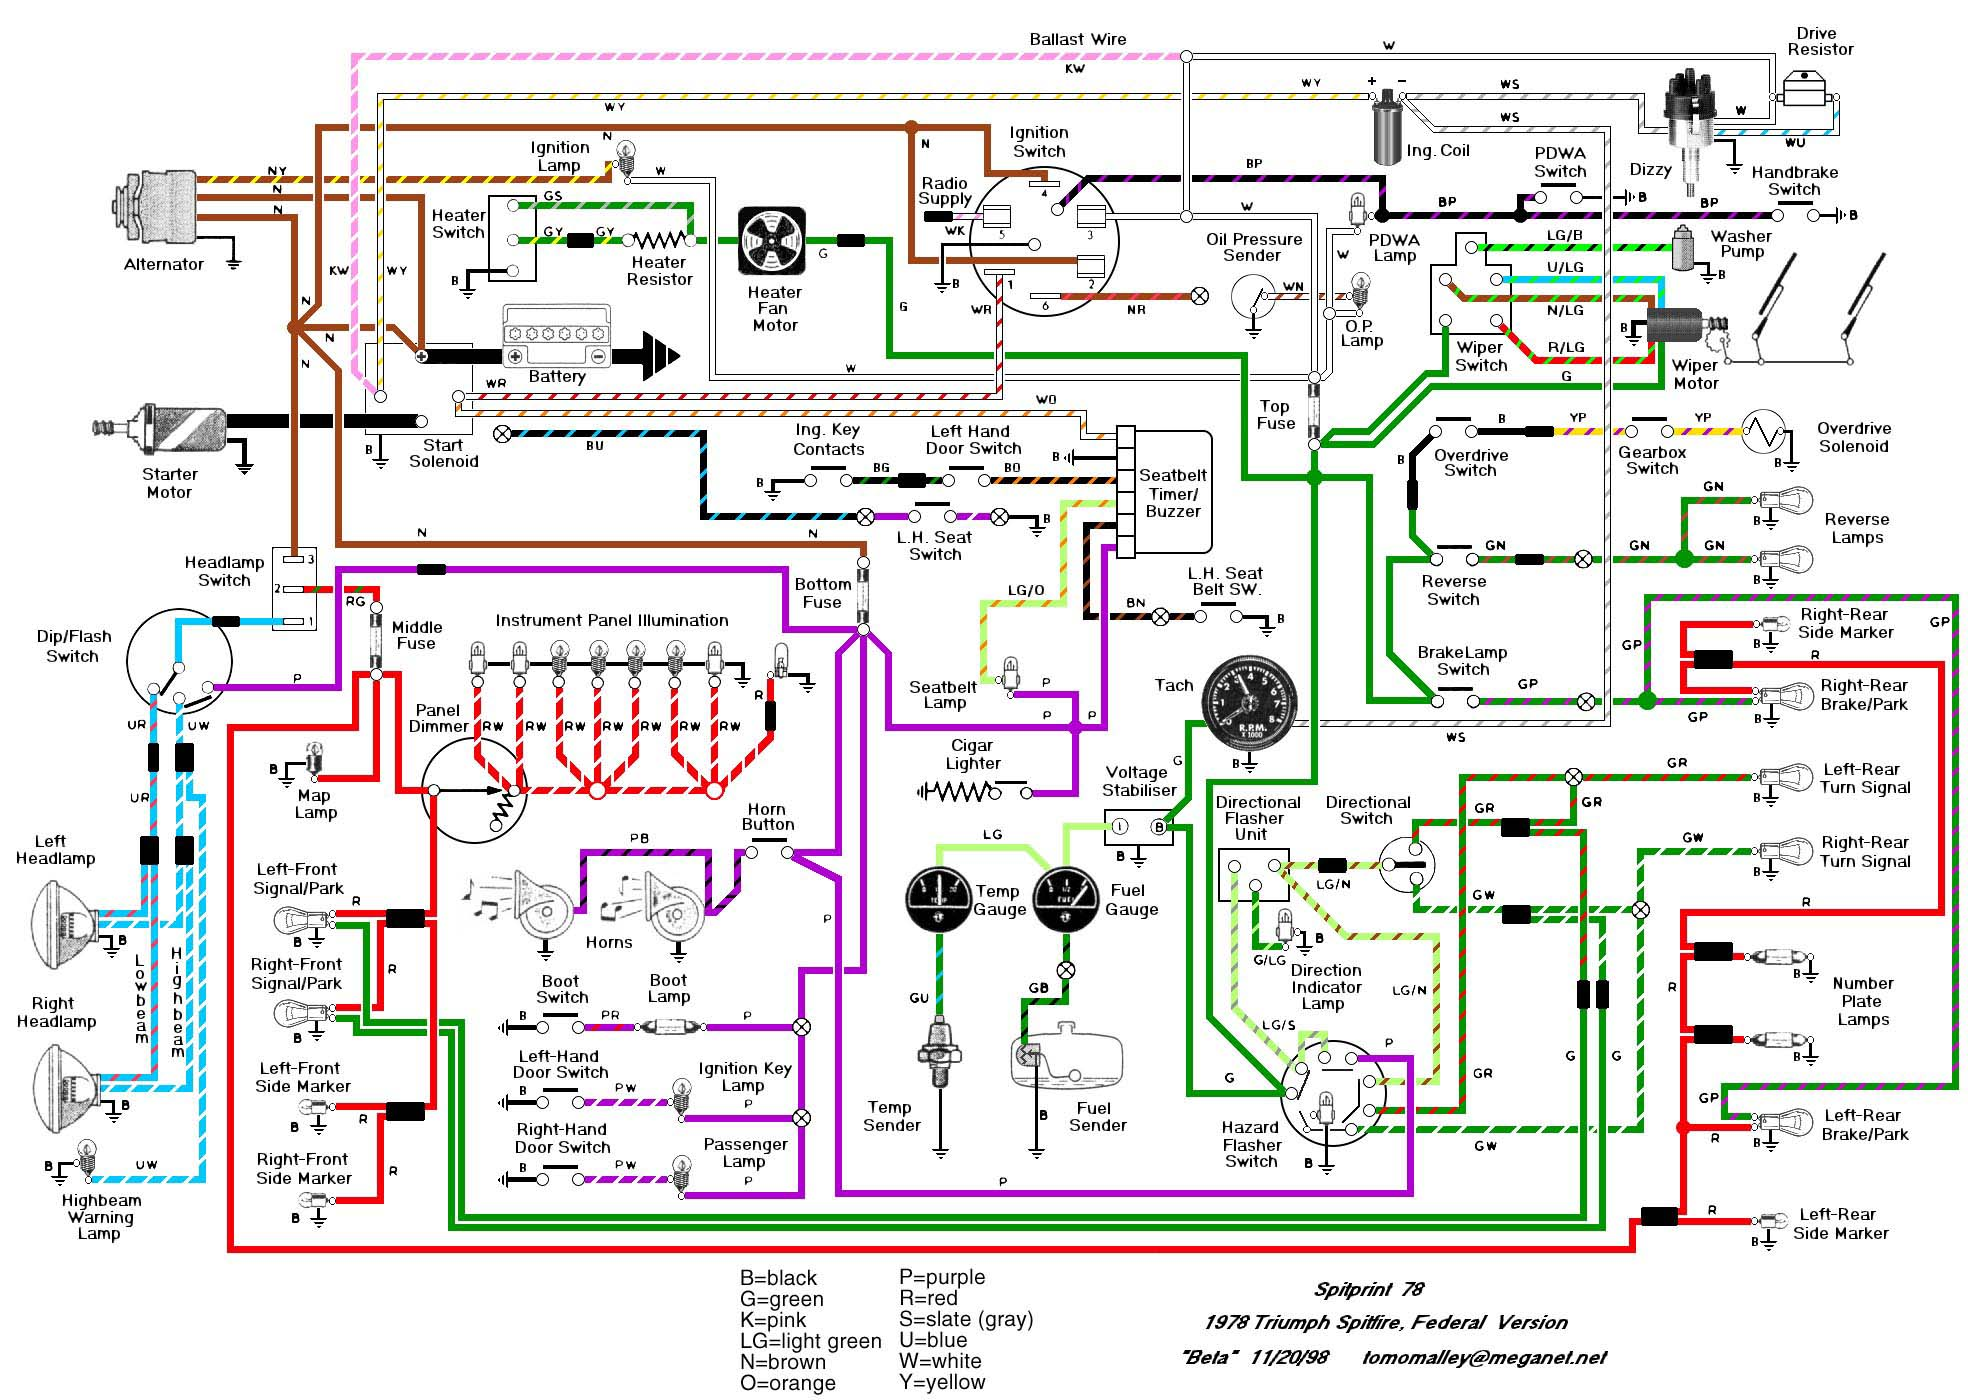 wiring diagram for triumph tr8 ford fairlane wiring diagram elsavadorla